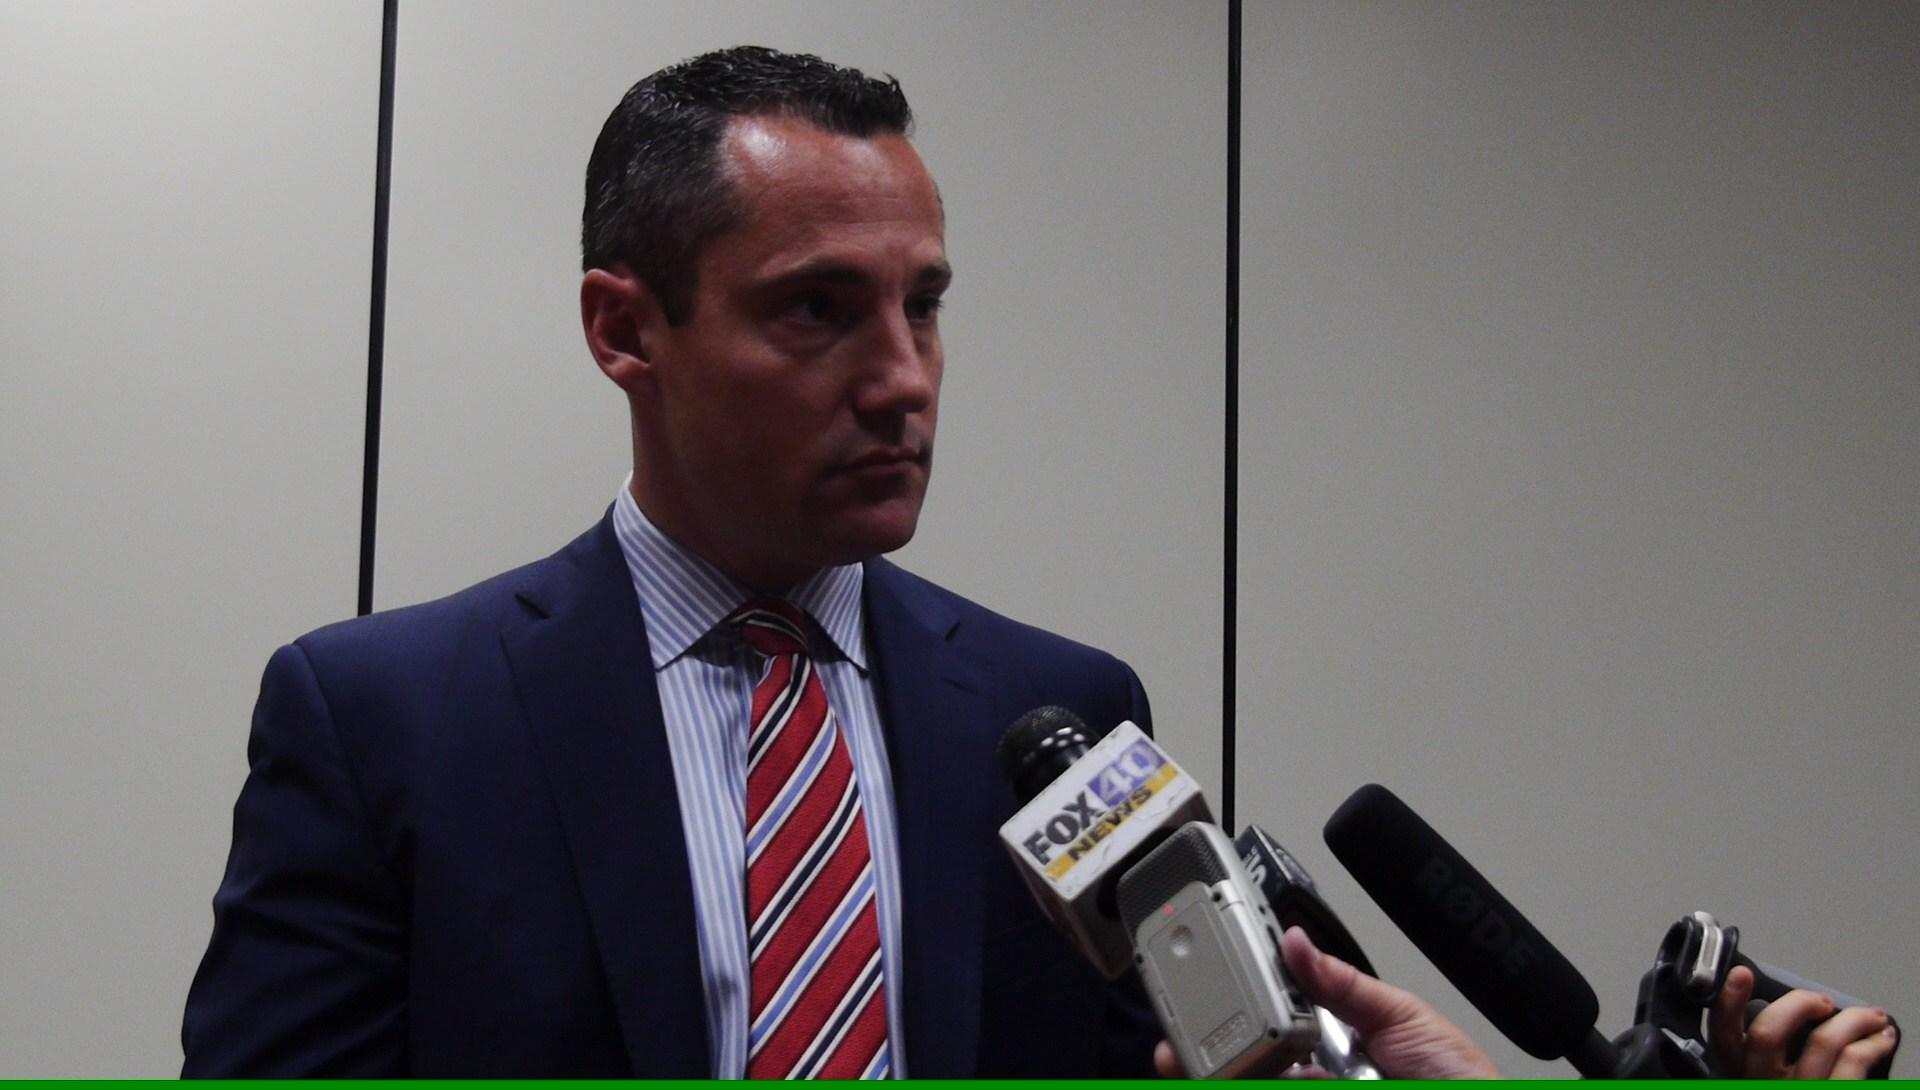 Preston's lawyer Paul Battisti talks to reporters on Oct. 10